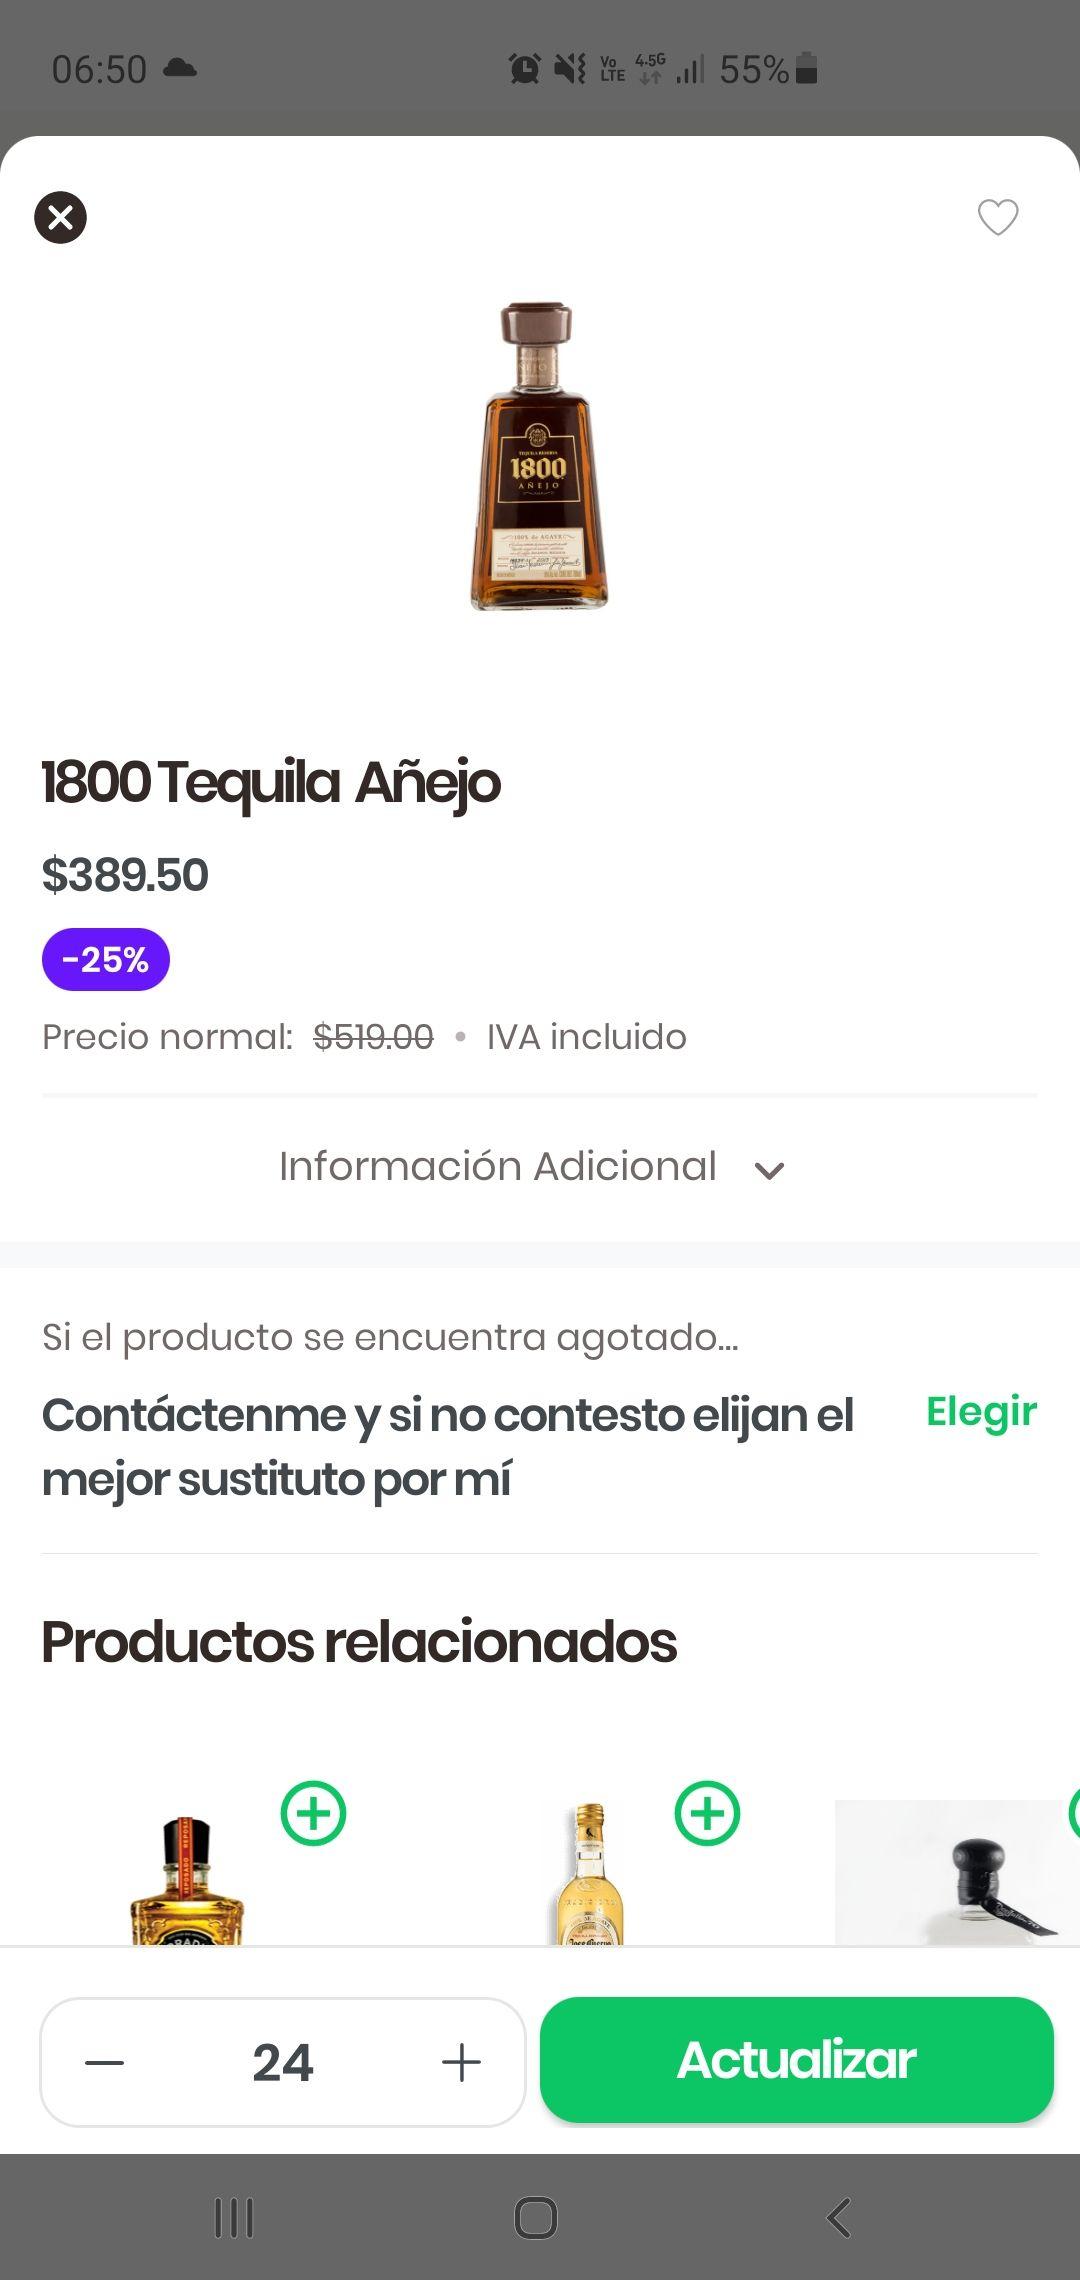 Rappi: Costco Tequila 1800 Añejo